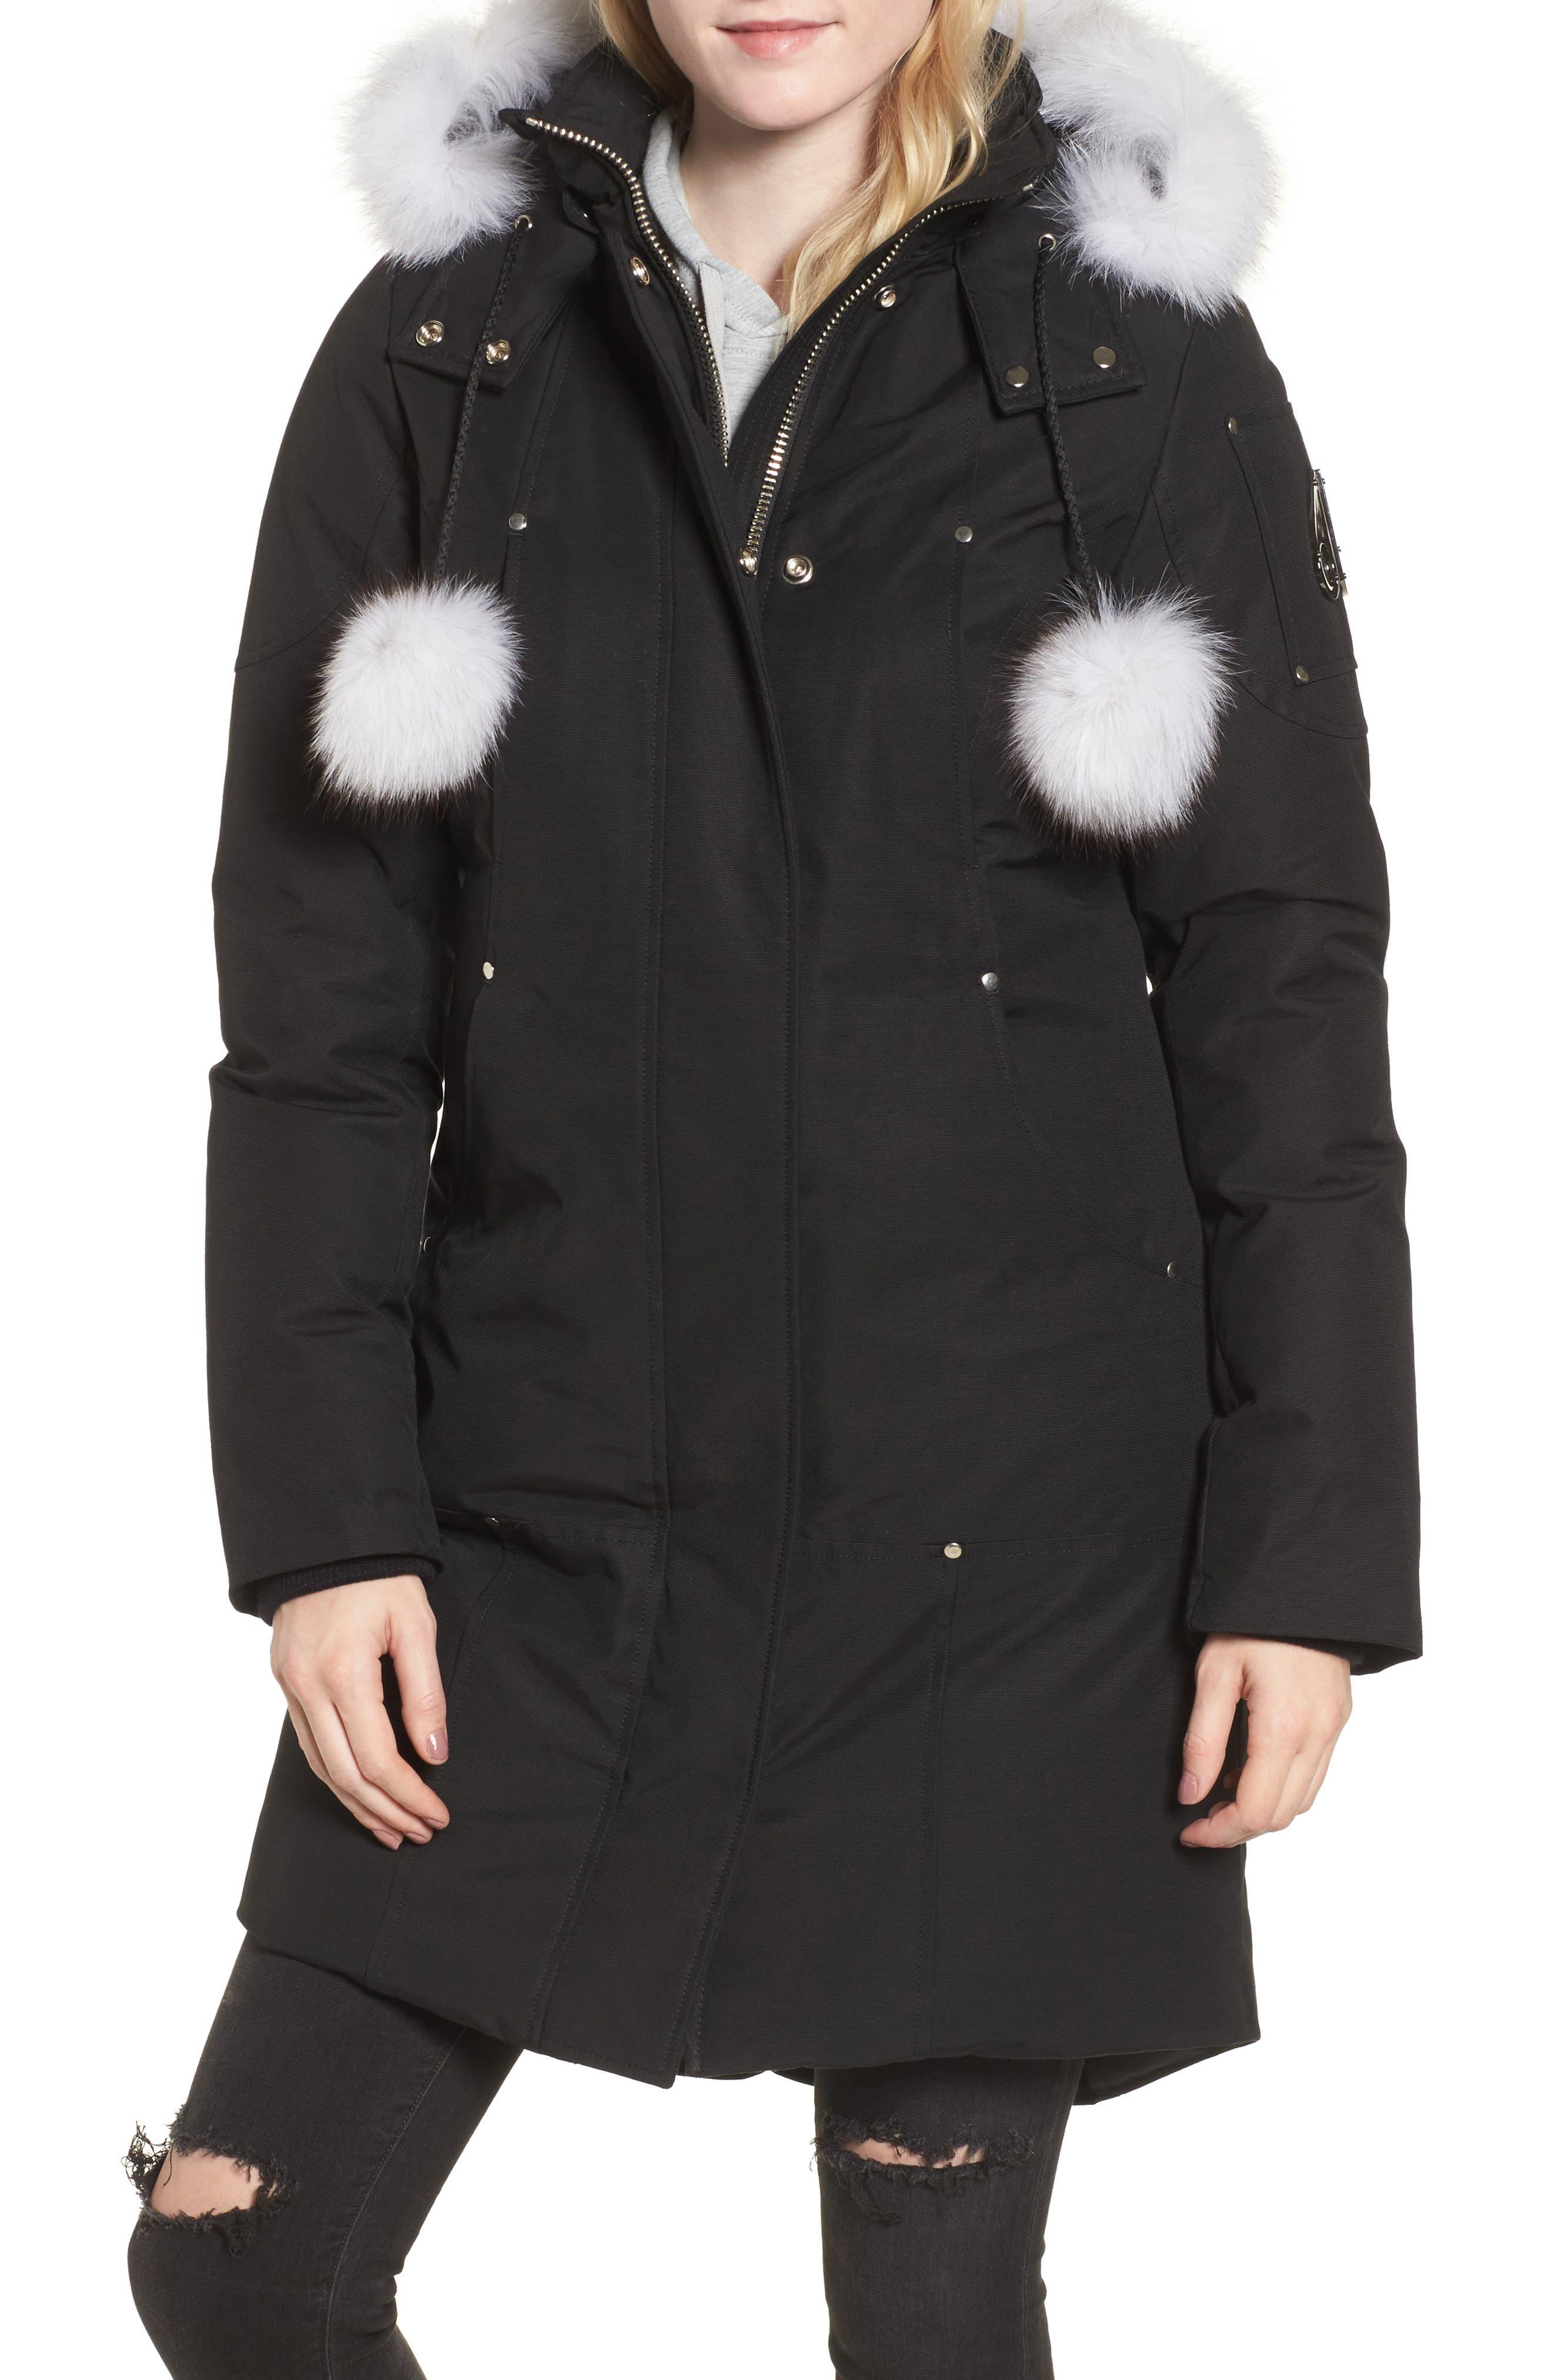 Main Image - Moose Knuckles 'Stirling' Down Parka with Genuine Fox Fur Trim